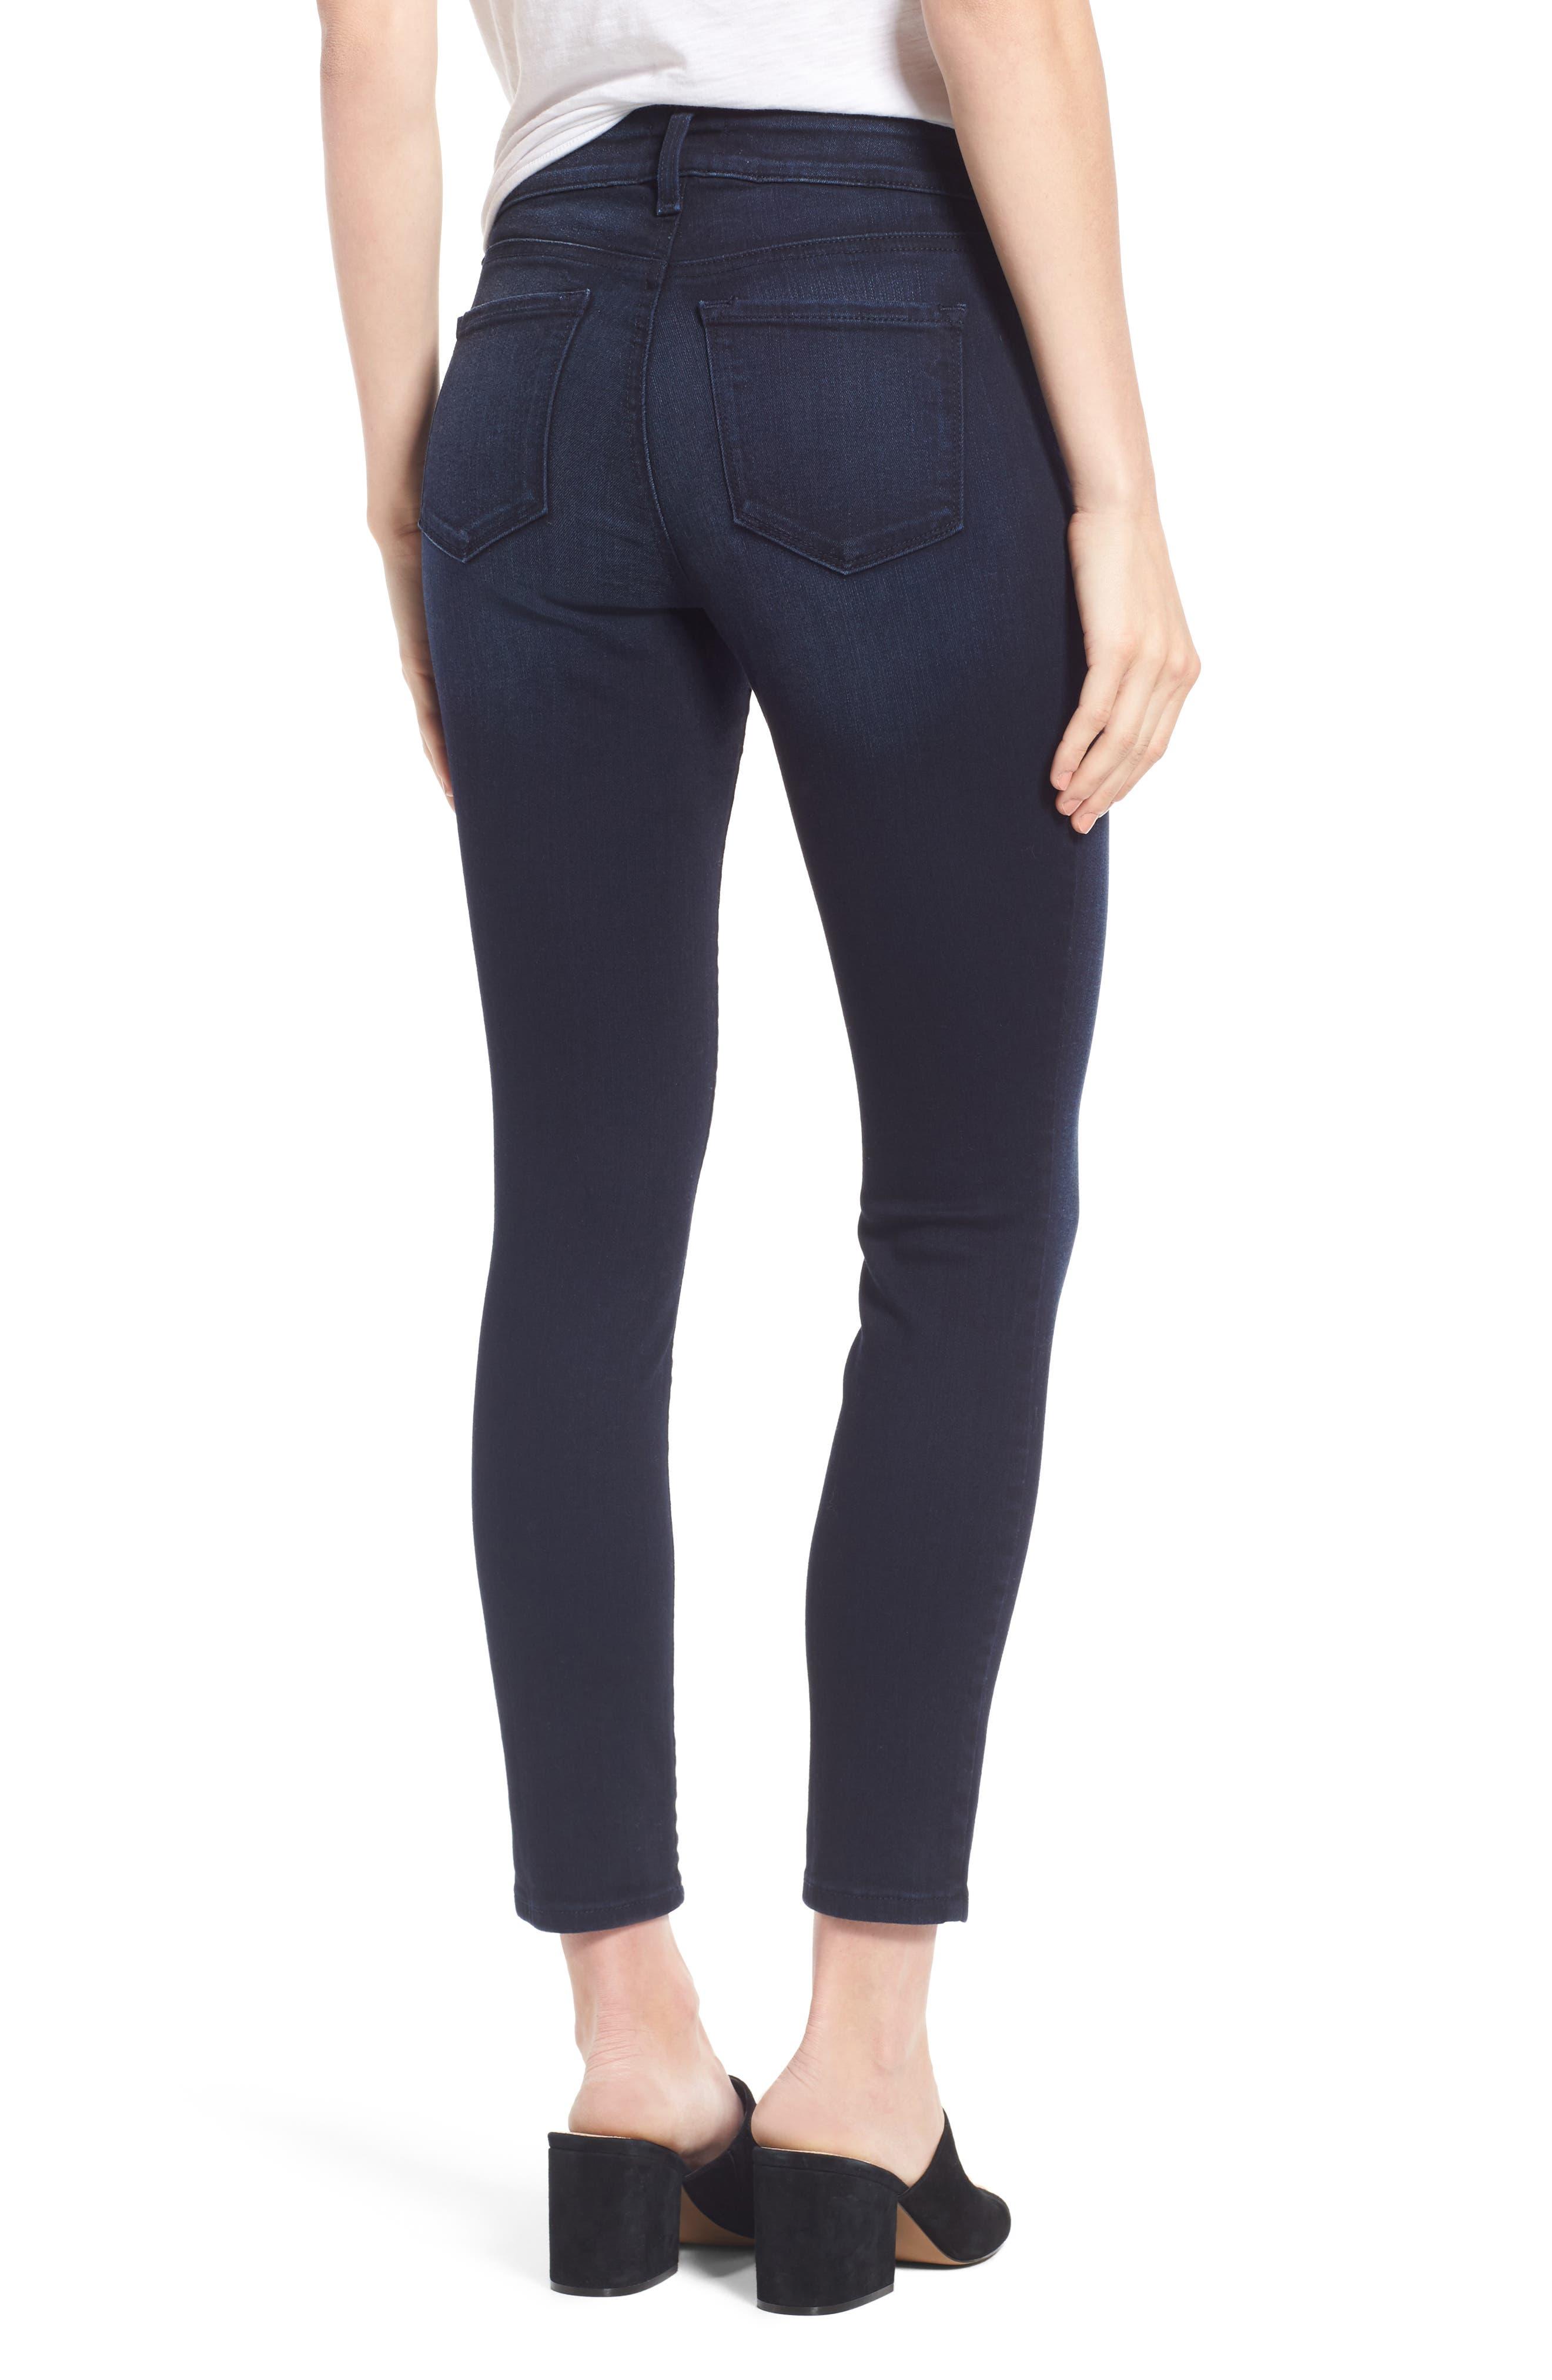 Alternate Image 3  - NYDJ Ami Stretch Ankle Skinny Jeans (Sinclair) (Regular & Petite)